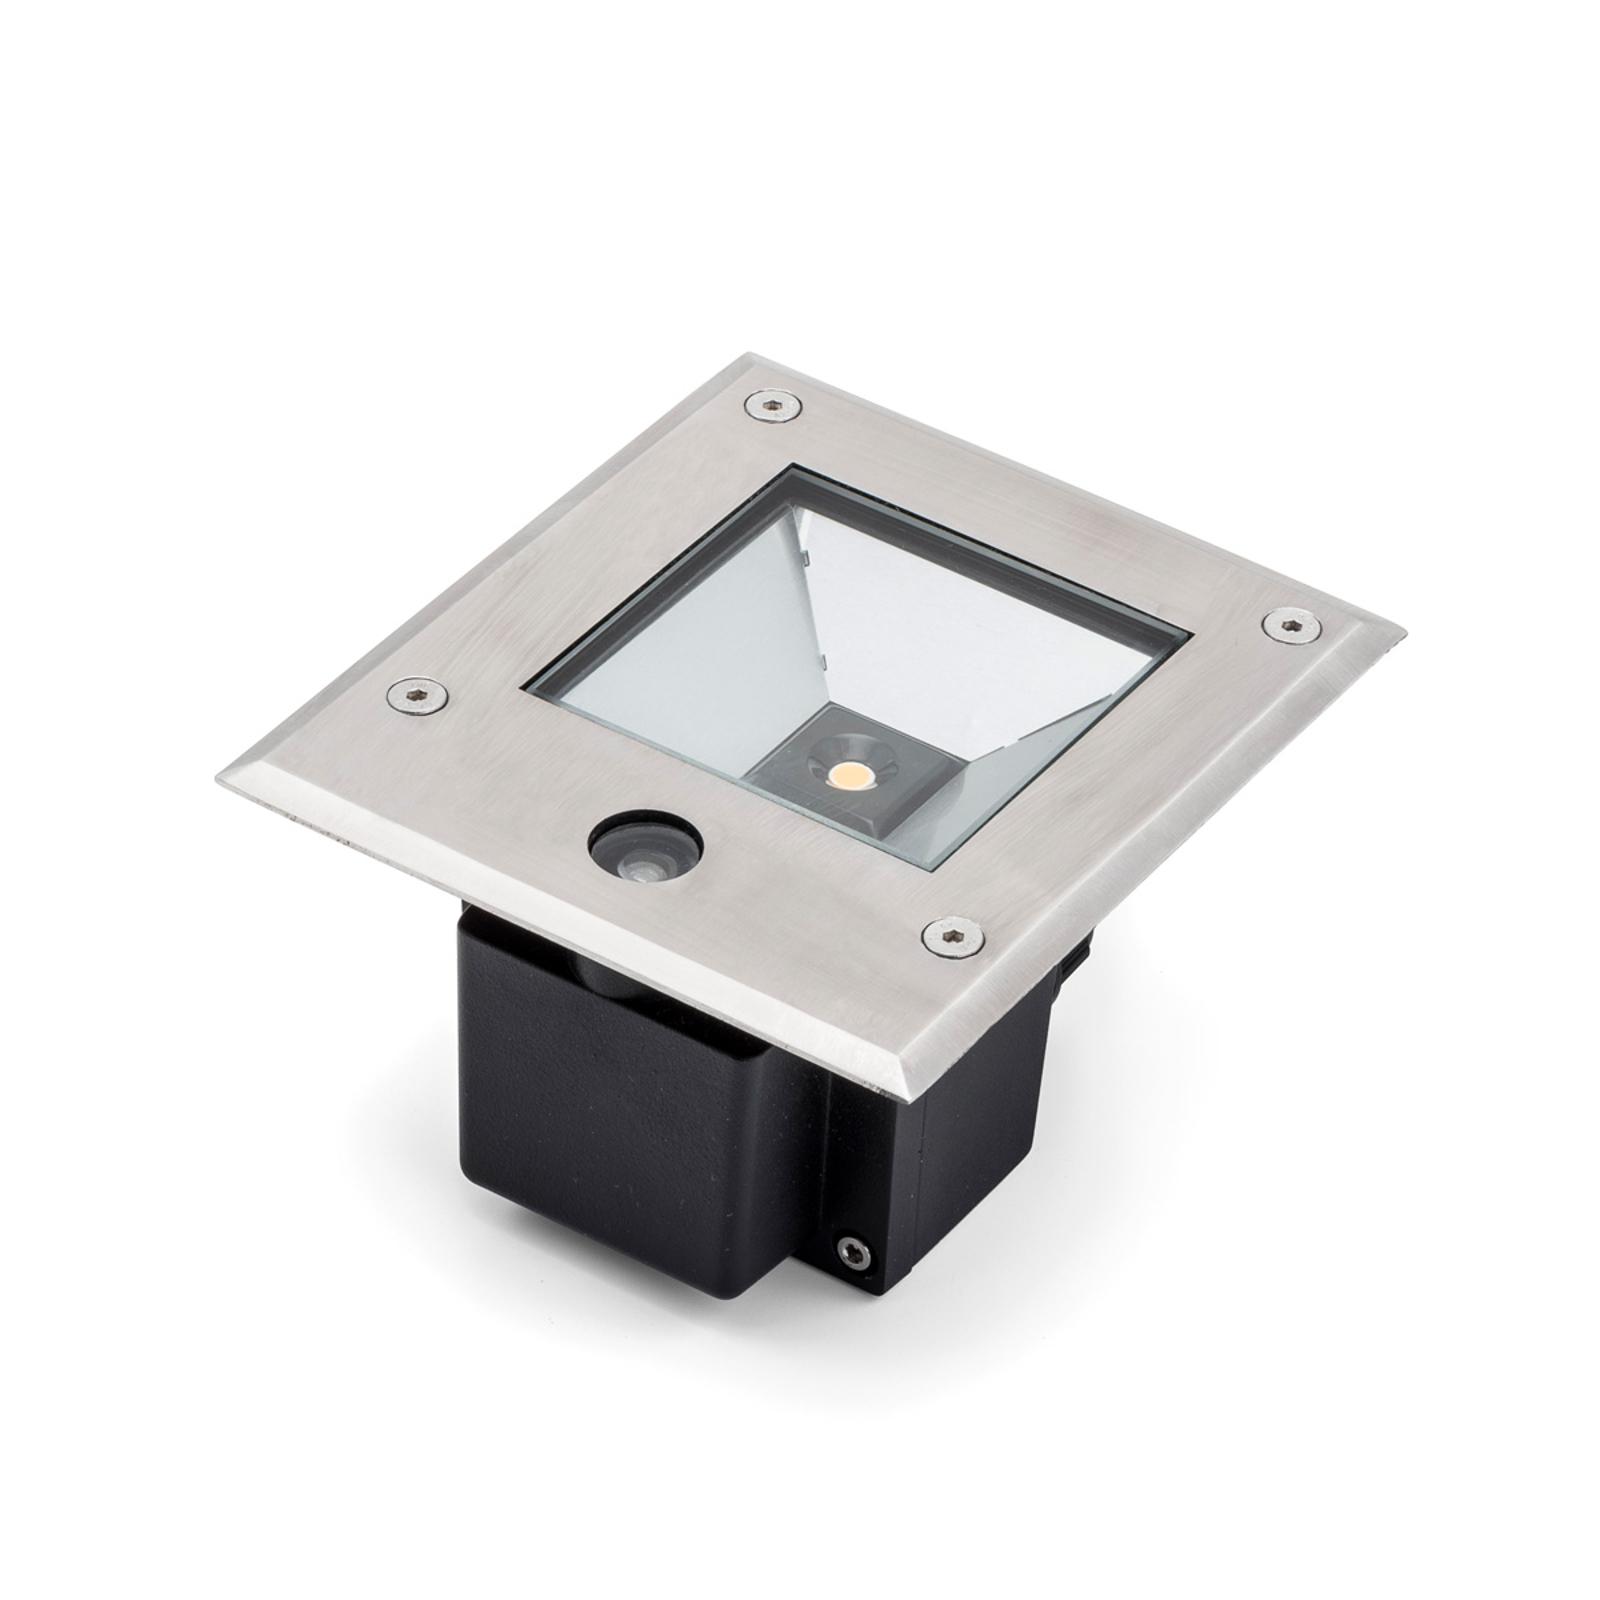 Dale LED-gulvspot 9 W dimm.-sensor